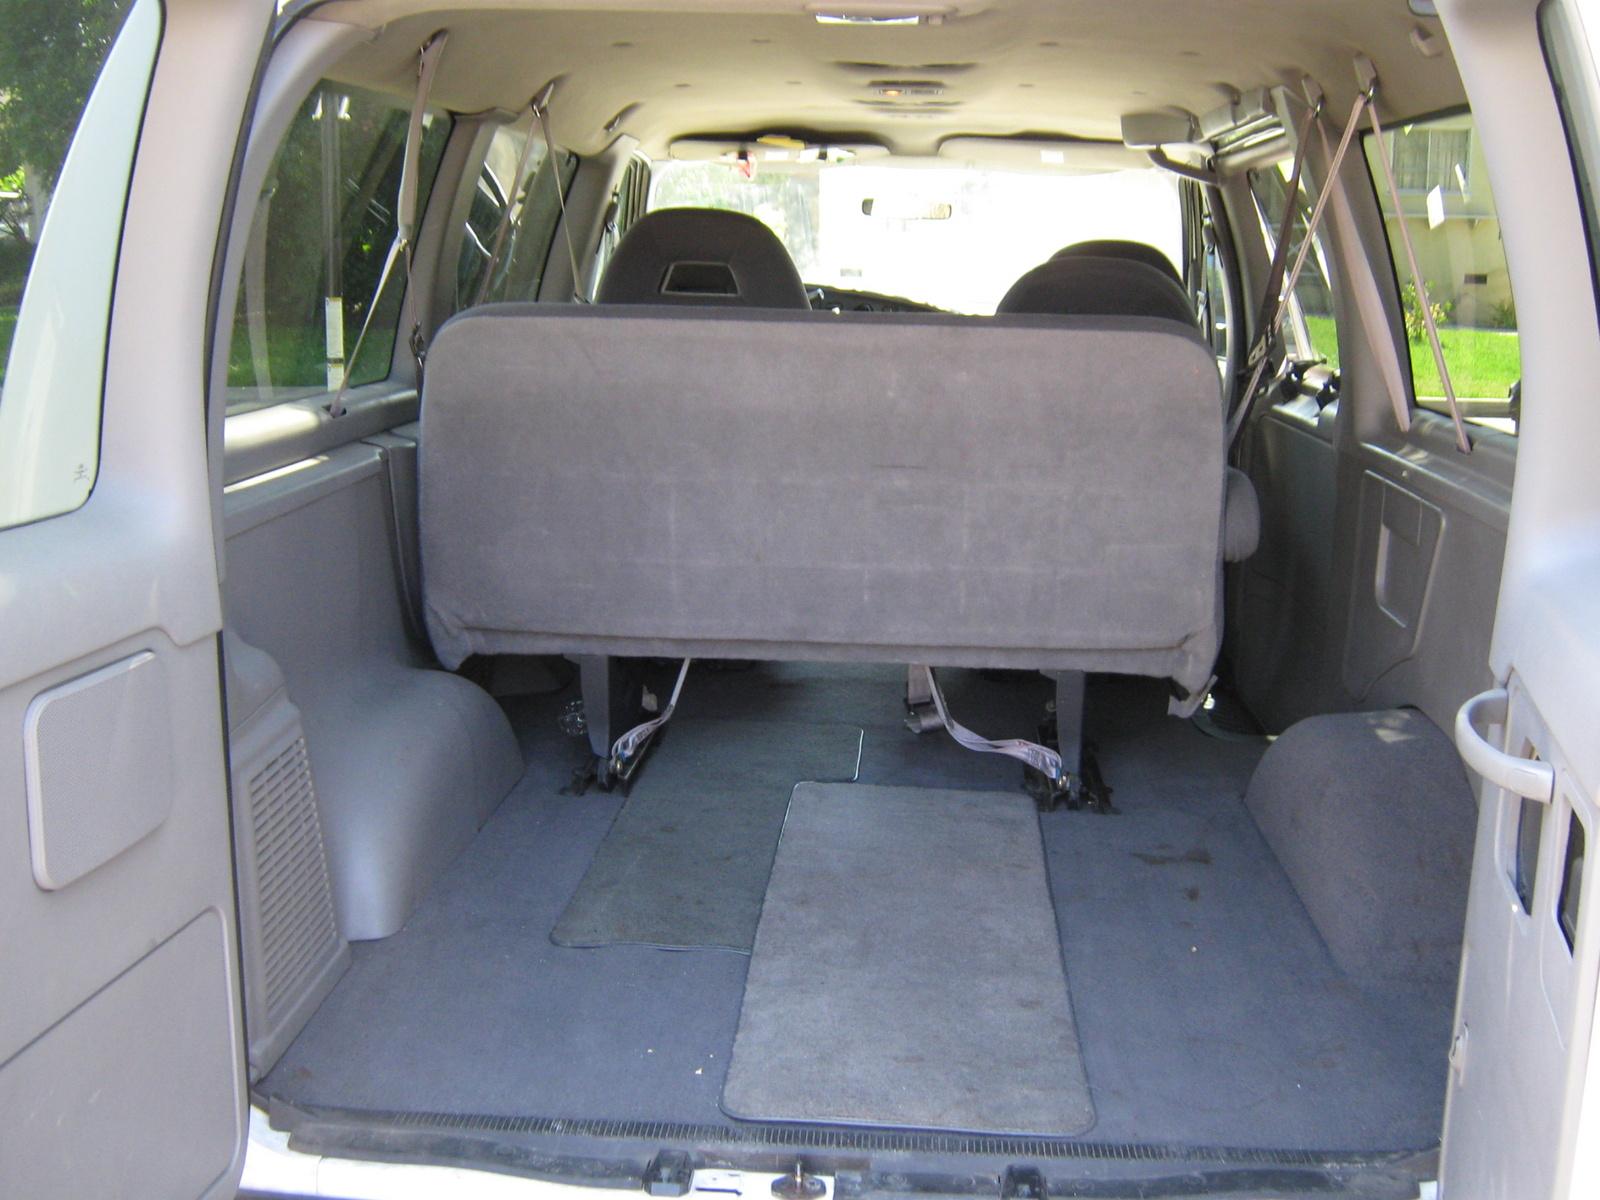 Ford Econoline Passenger Van Interior